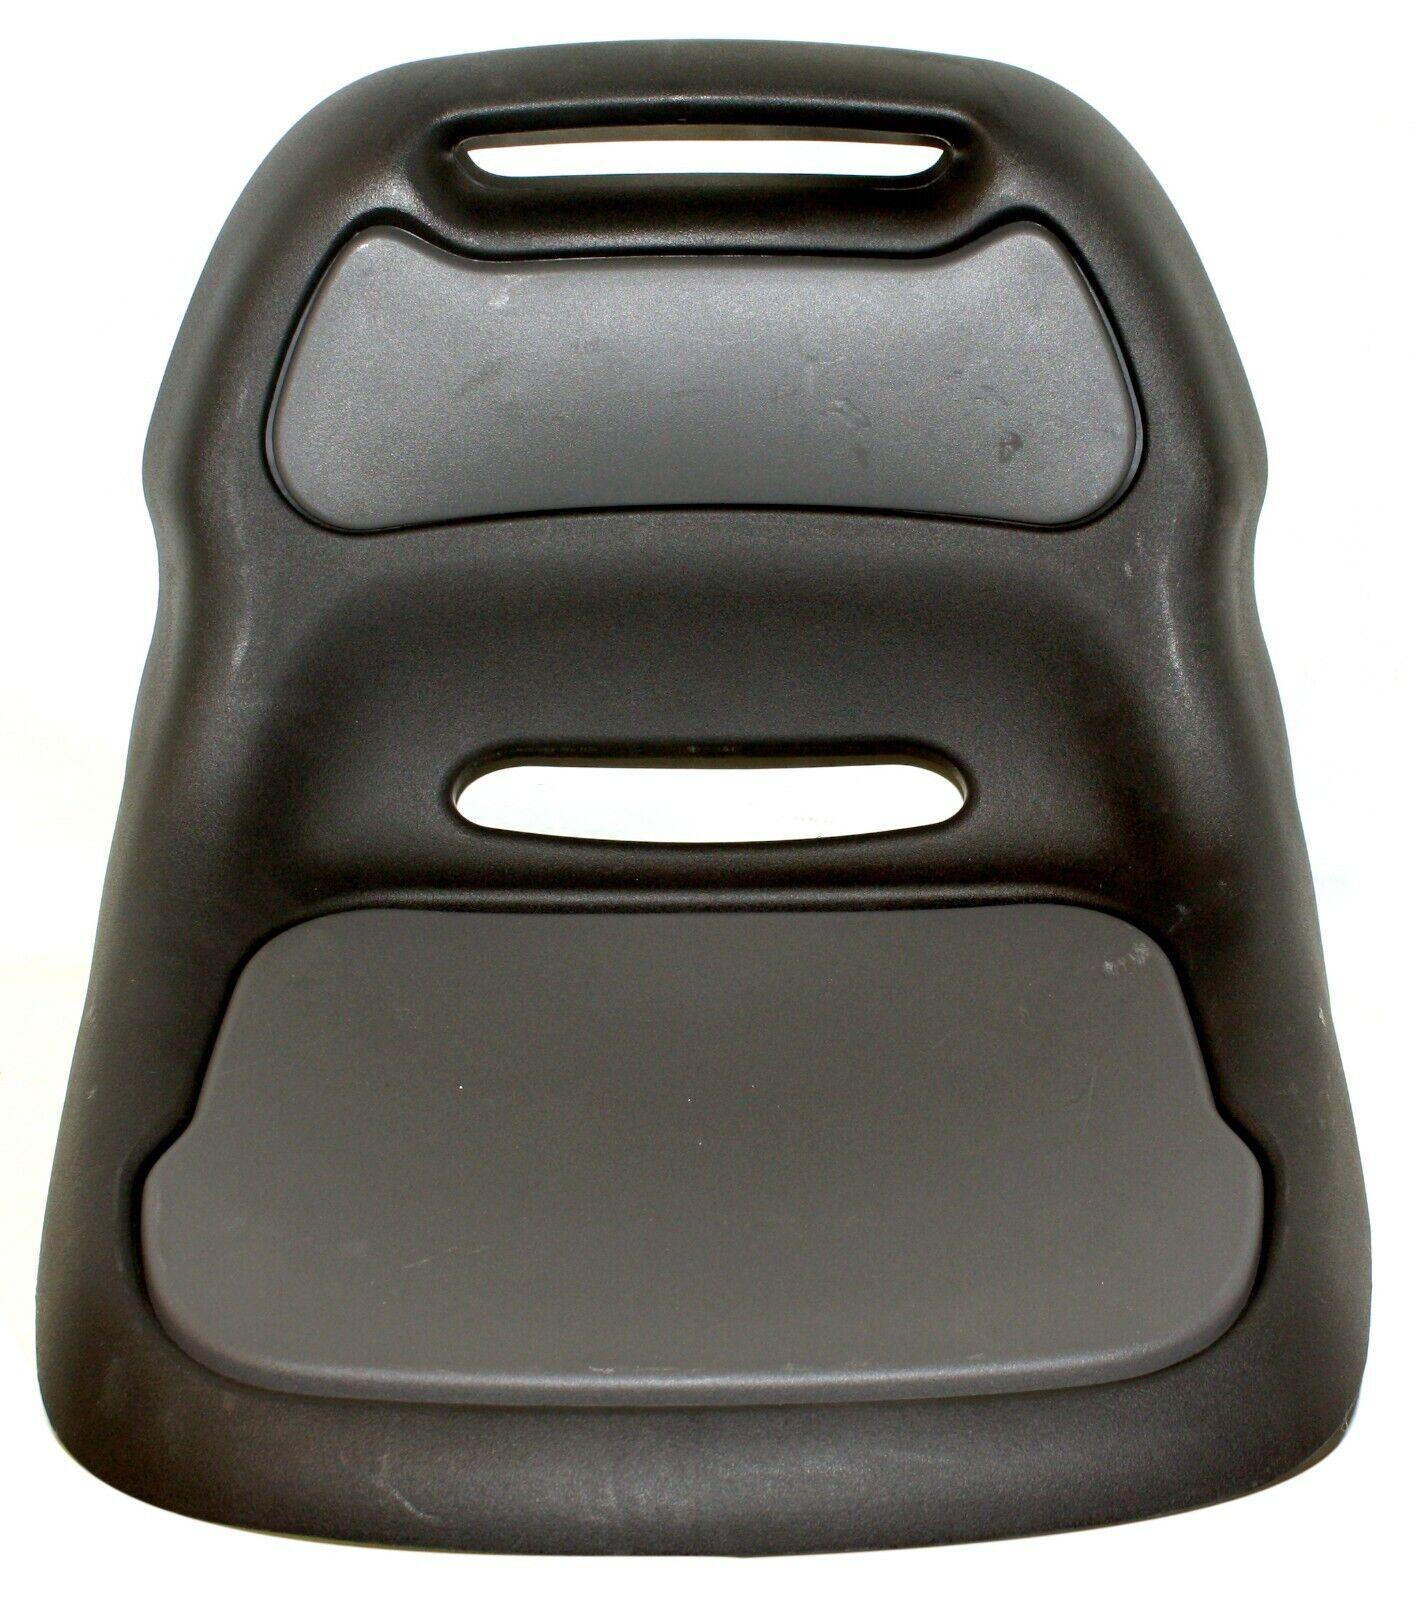 440693   428243 - Craftsman Replacement Lawn Mower Seat  Model WE261 WELRV